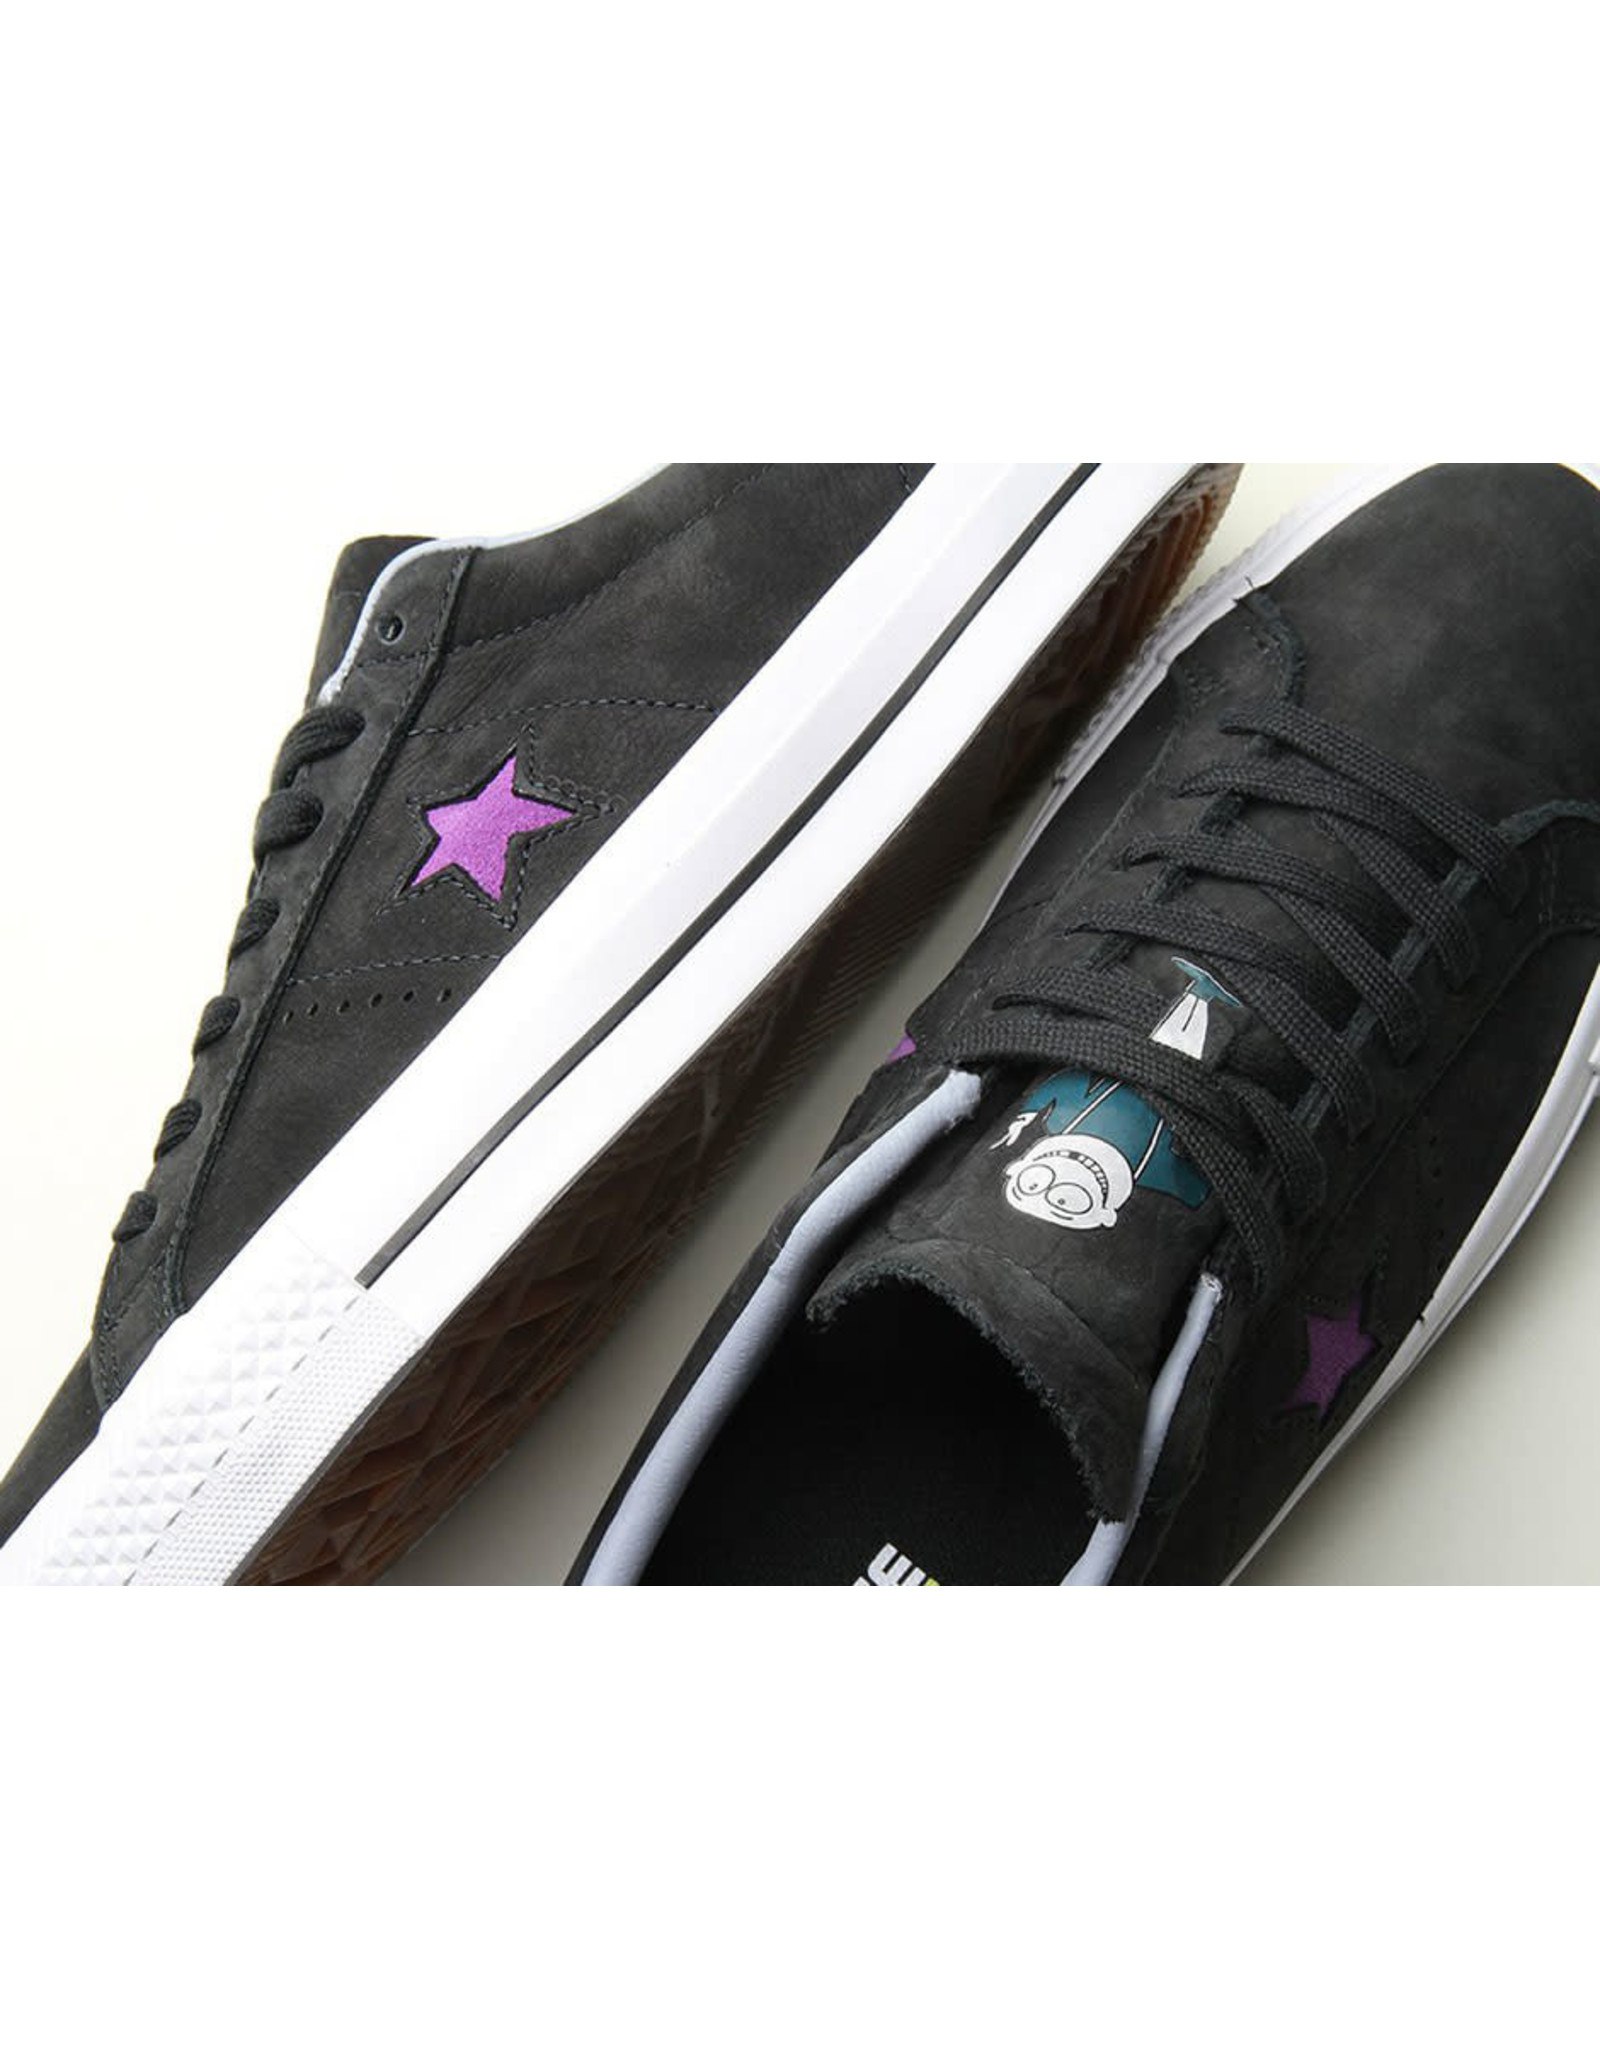 CONVERSE ONE STAR LEATHER OX PRO DINOSAUR JR BLACK CC786DINO-158660C